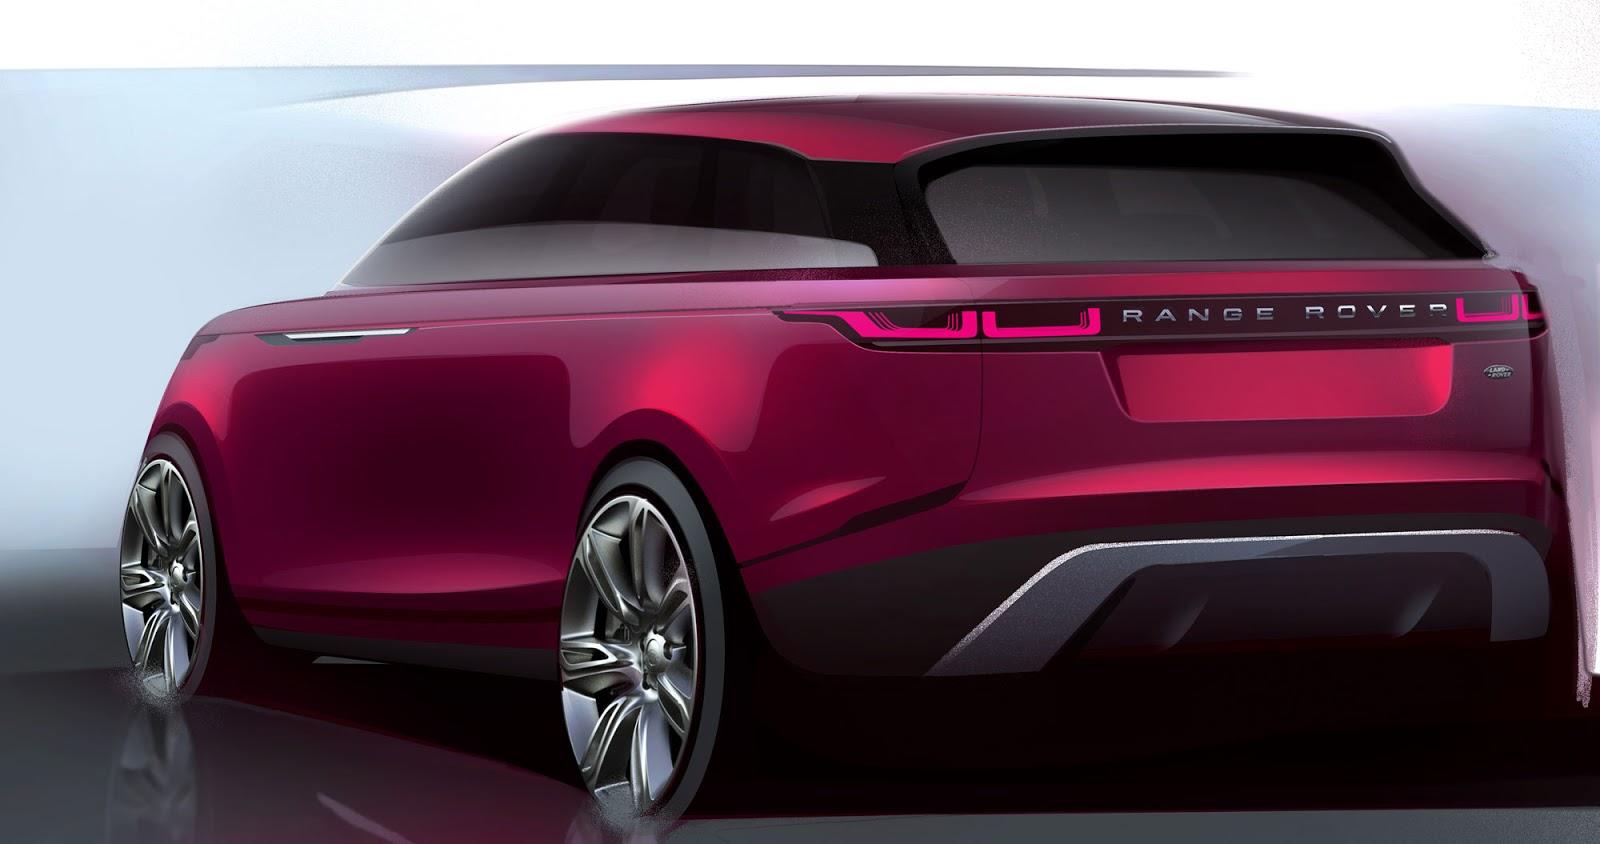 Range Rover Velar sketch rear quarter view in fuscia